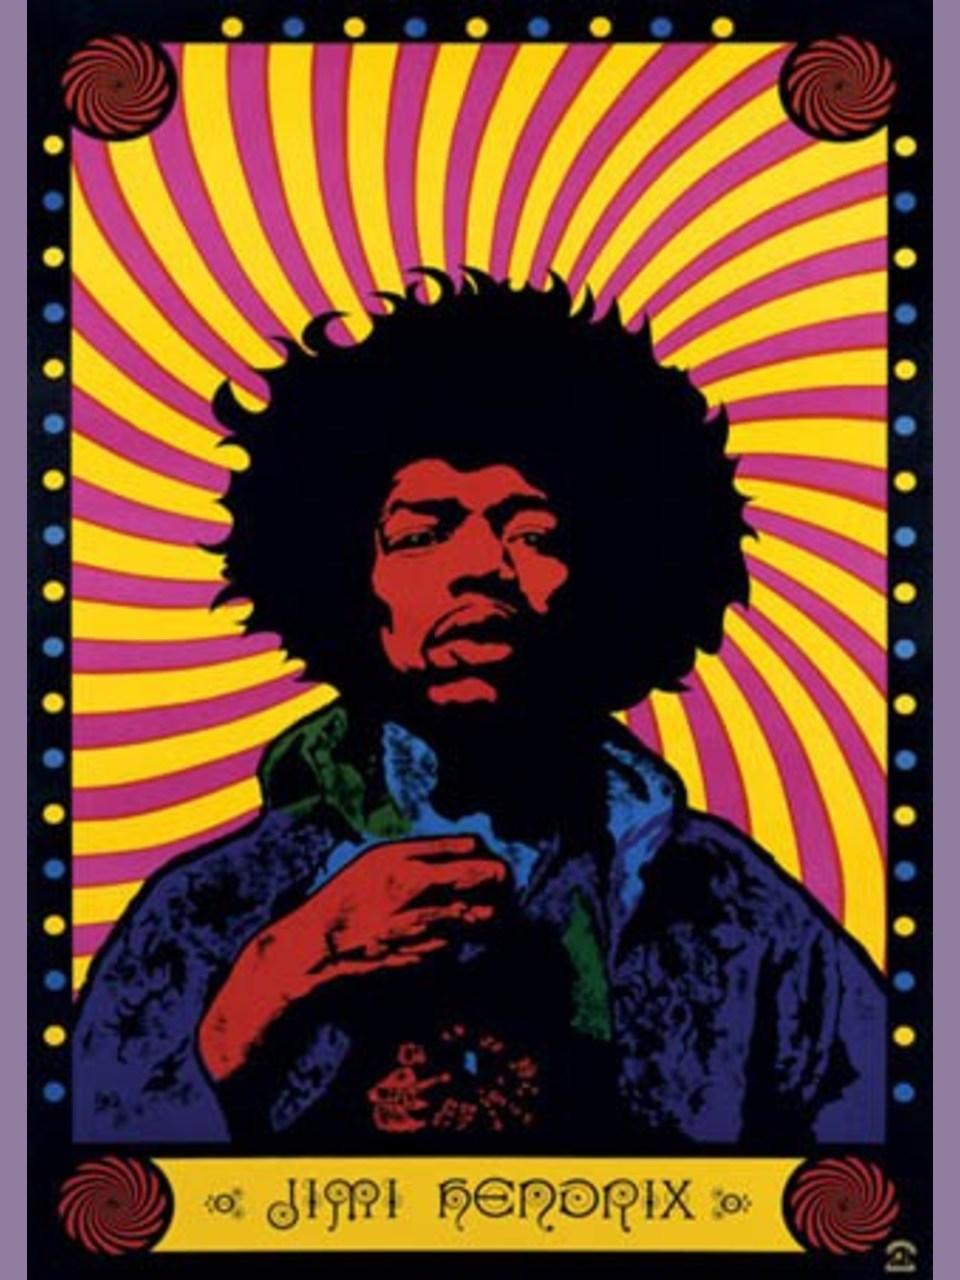 Jimi Hendrix 1967 Purple Haze